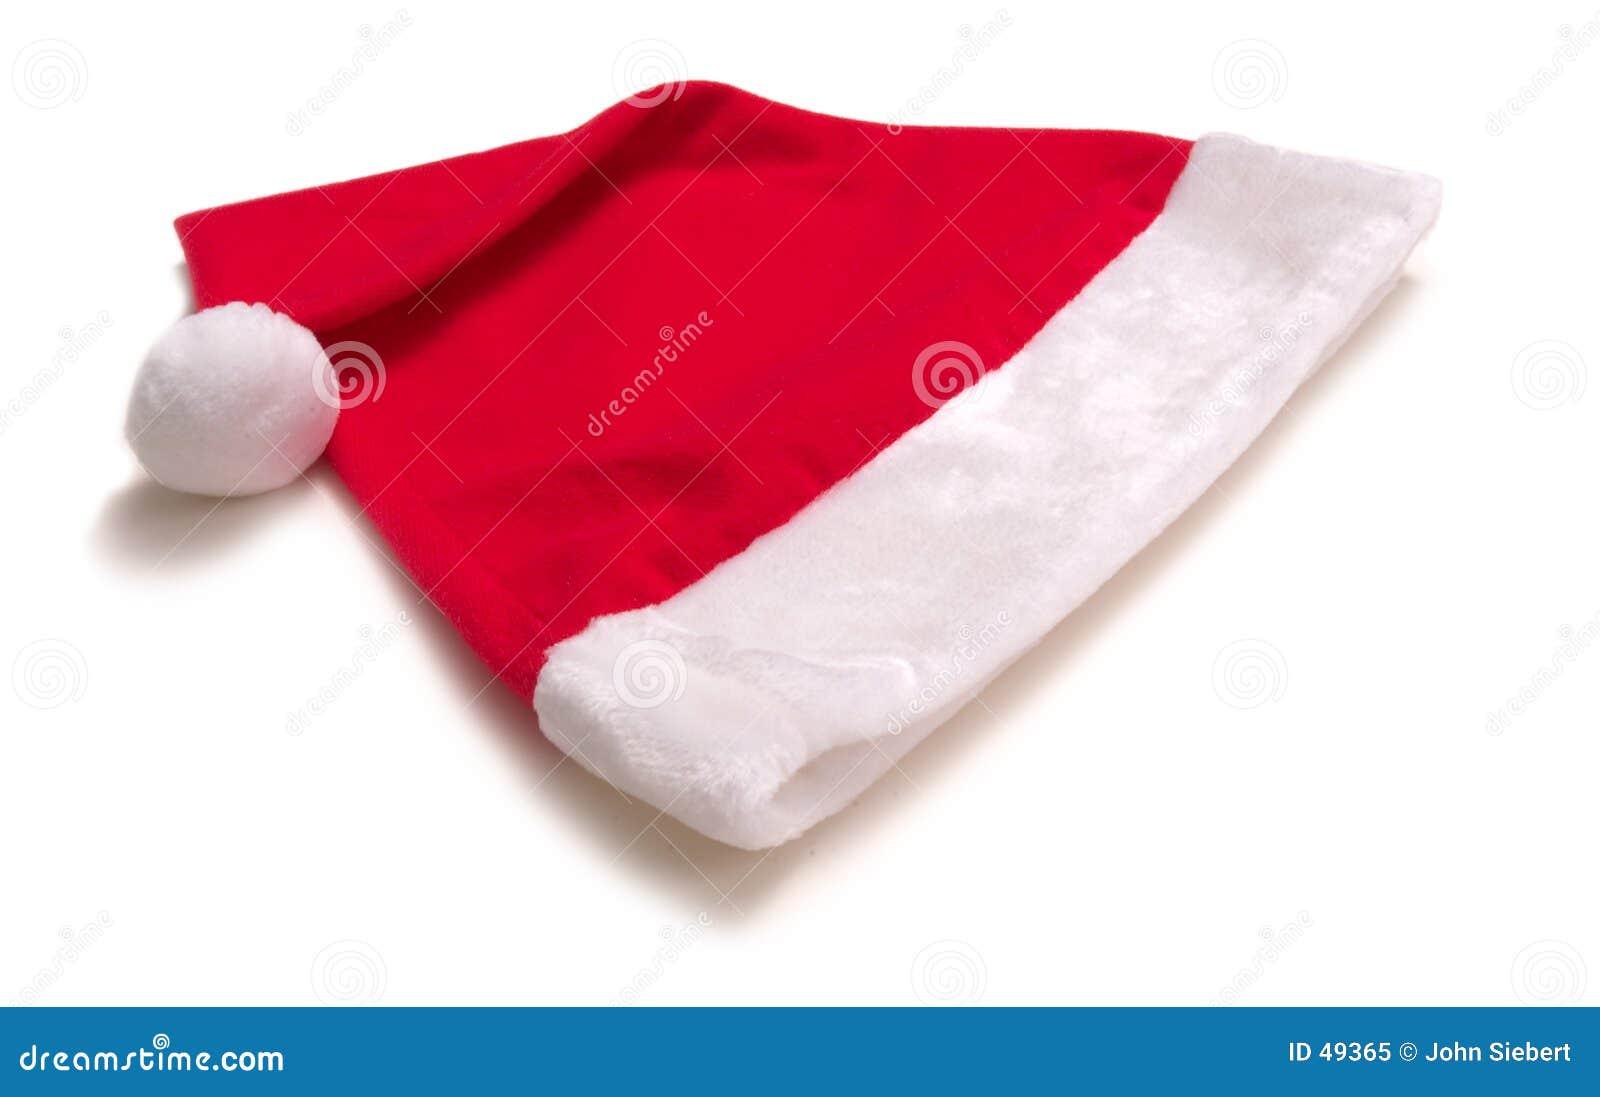 Kerstman GLB